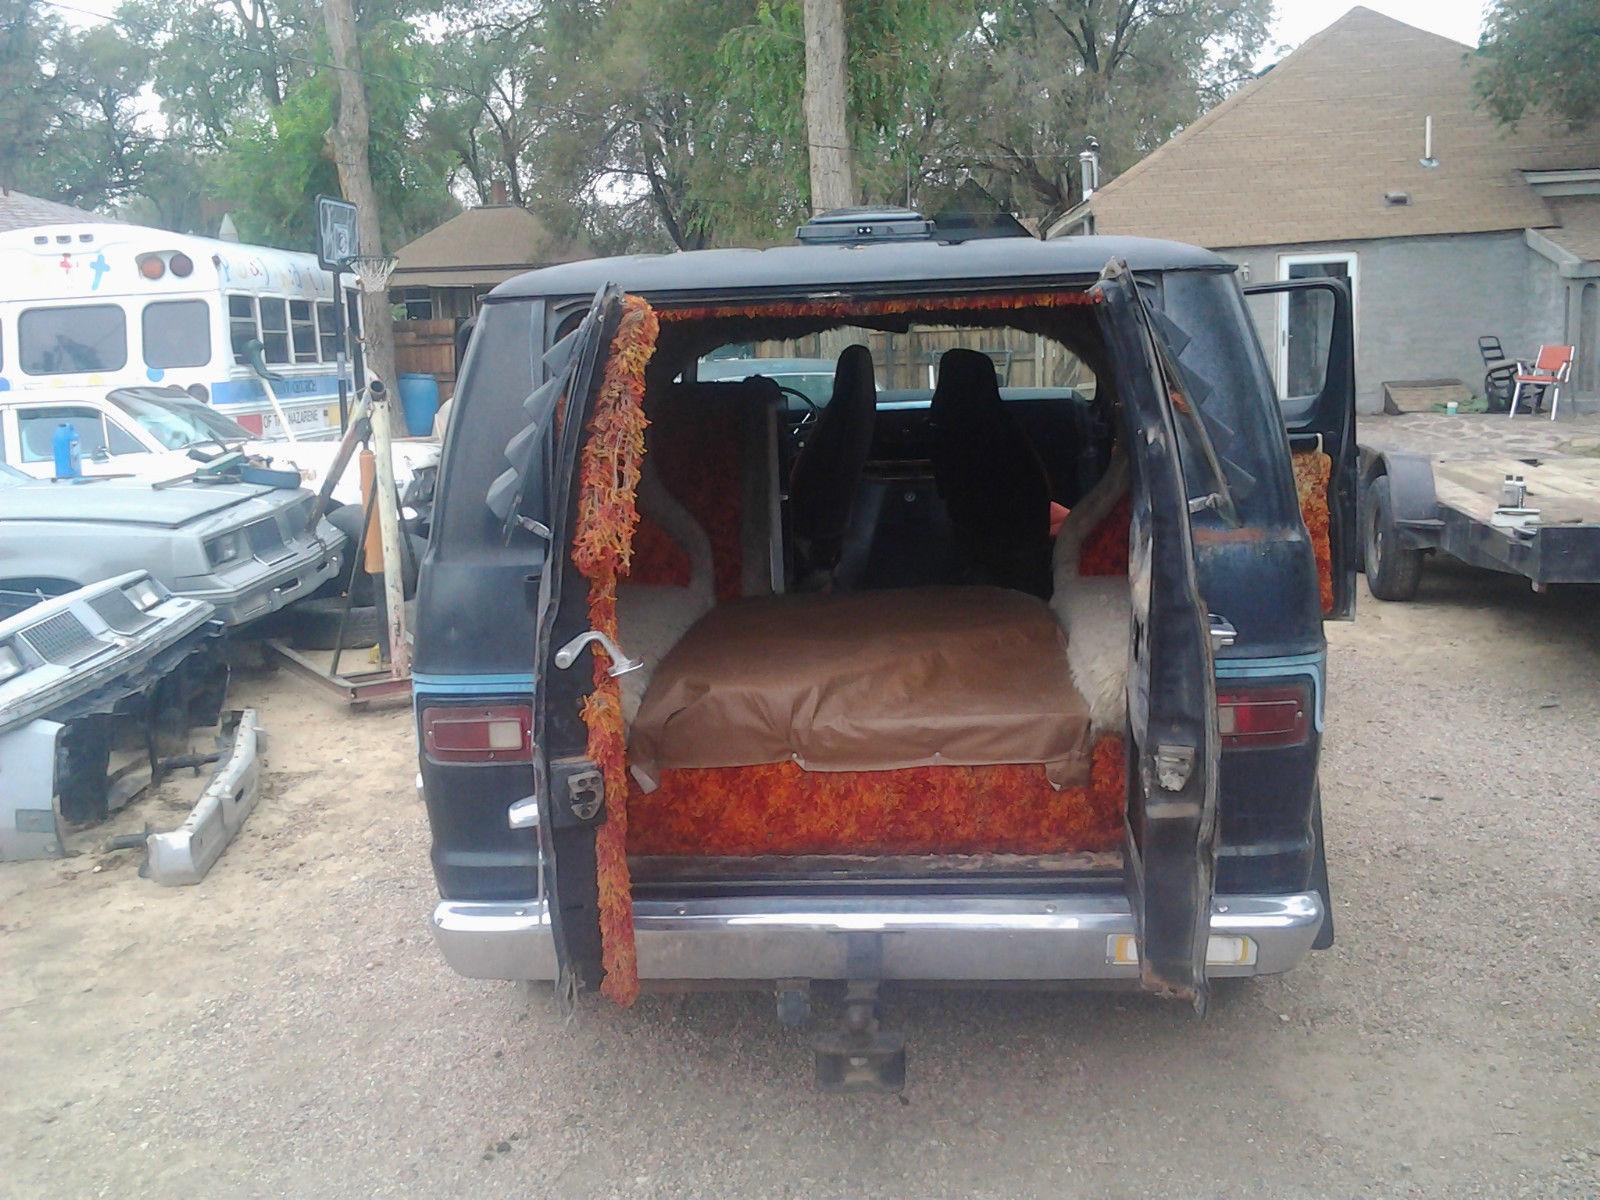 1974 Chevy Van Interior